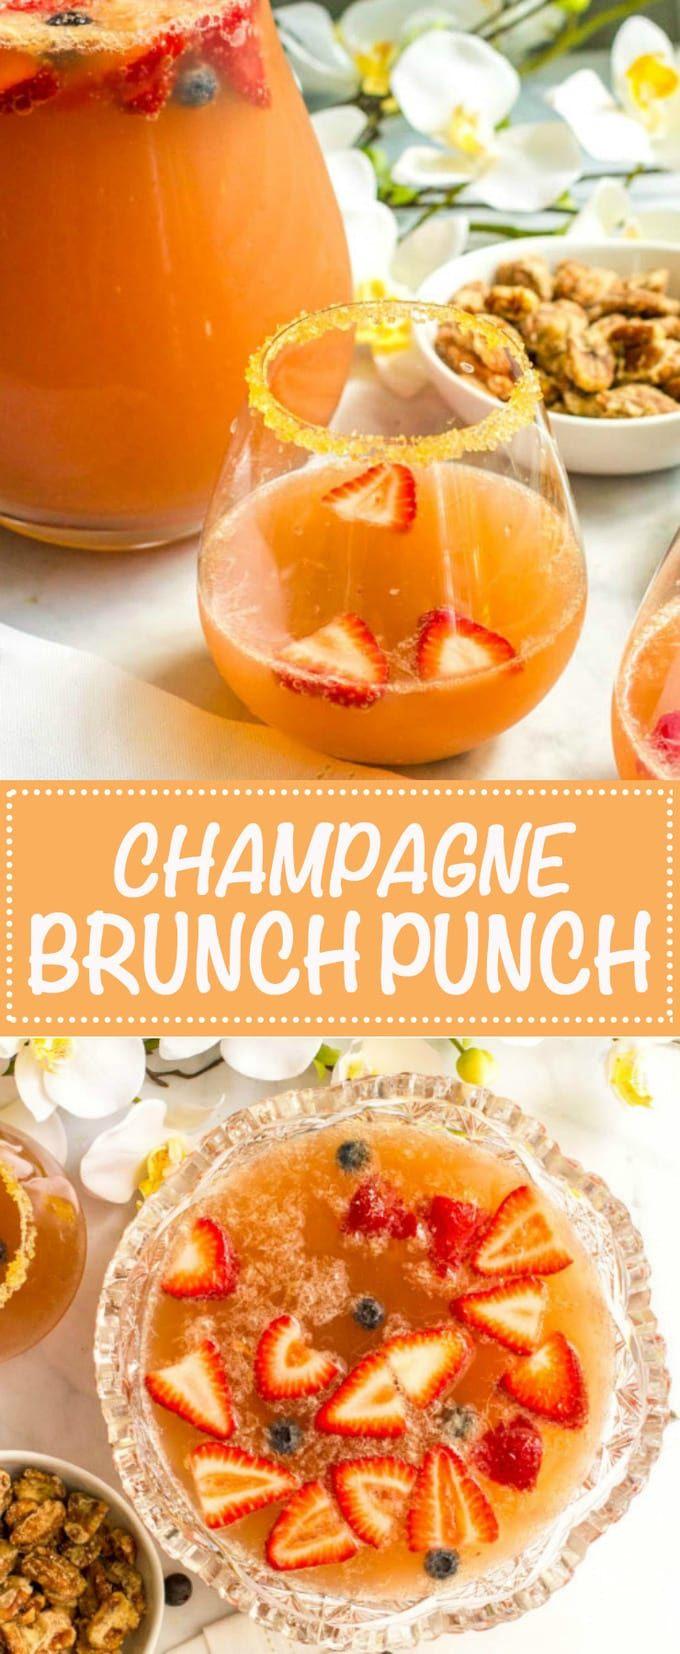 champagne ontbijt recept